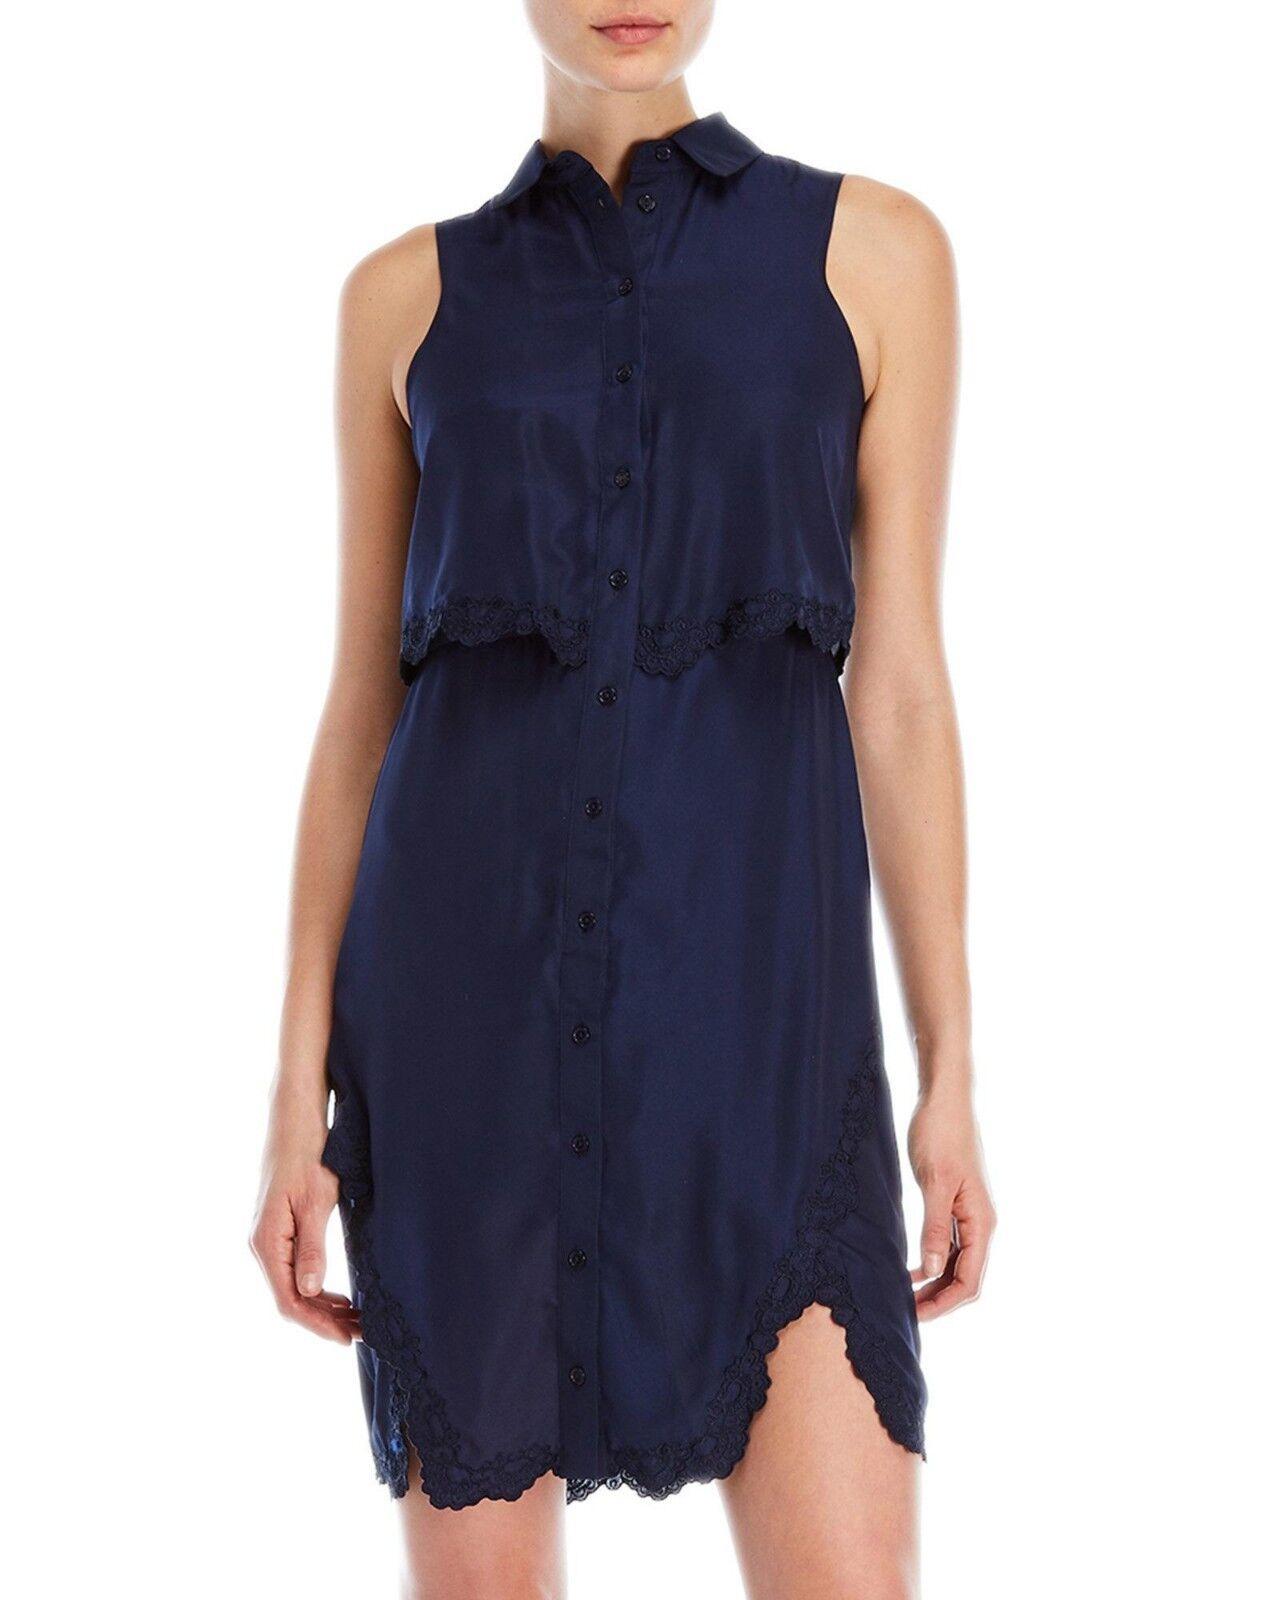 PARKER Aquarius Lace Trim Overlay Dress Size XS NWT  398